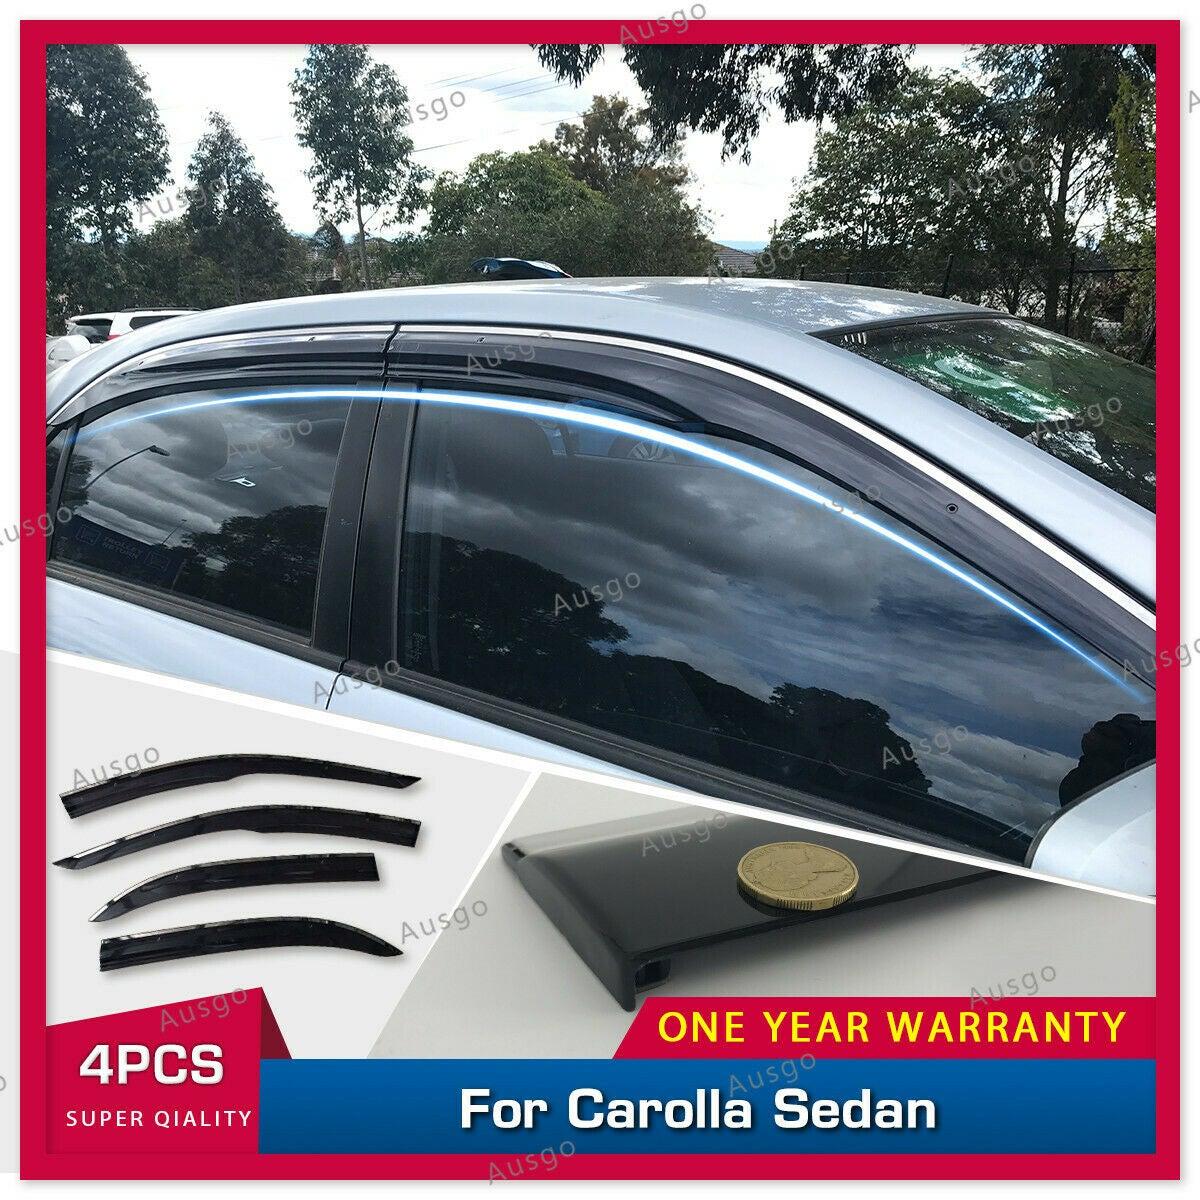 Stainless Steel Weathershields Weather Shields Window Visor for Toyota Corolla sedan 01-07 #T